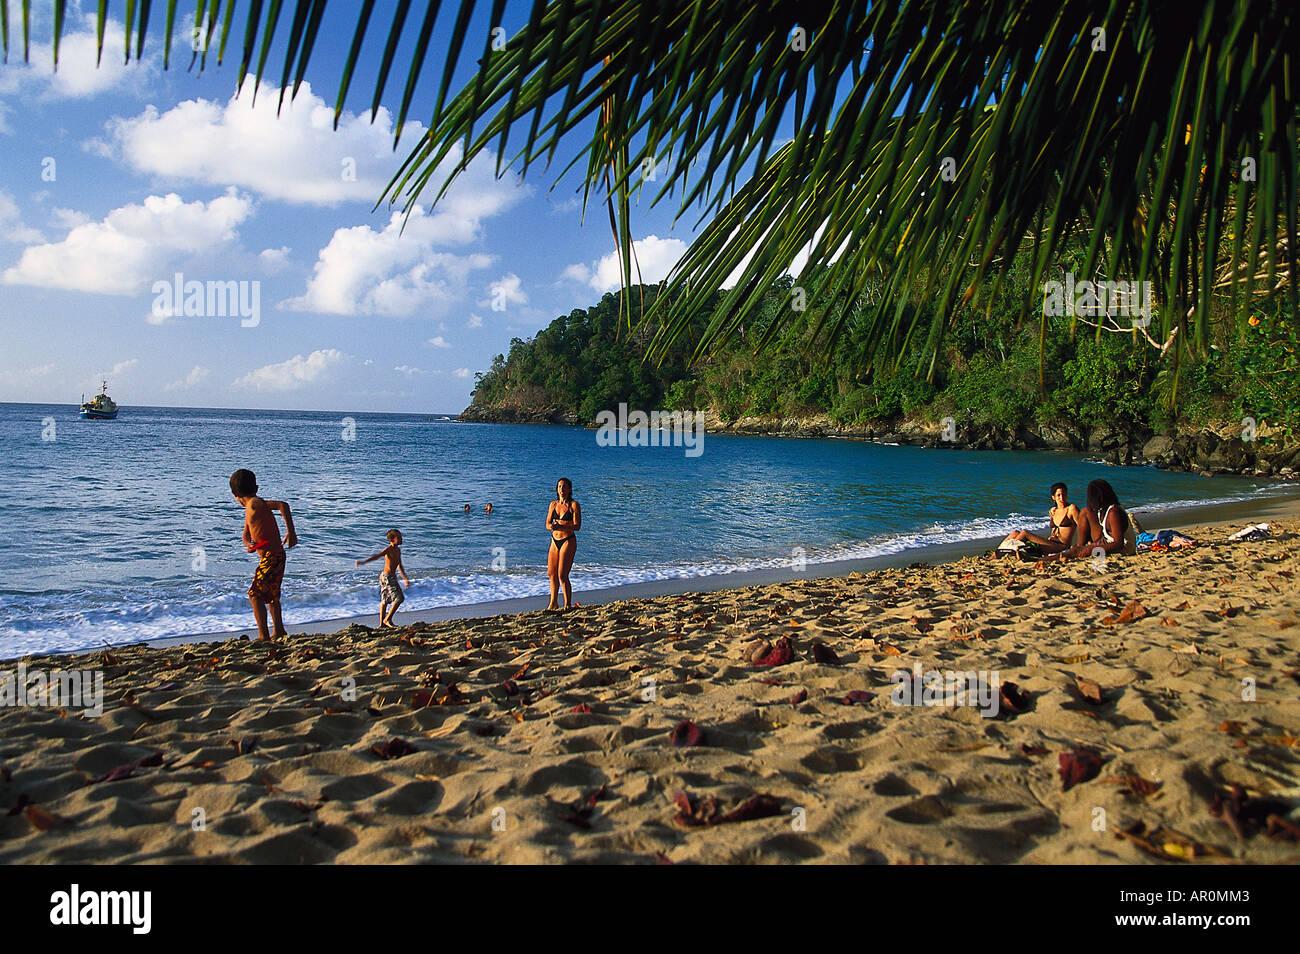 Sandstrand, Englishman Bay, Nordkueste von Tobago, West Indies, Karibik - Stock Image